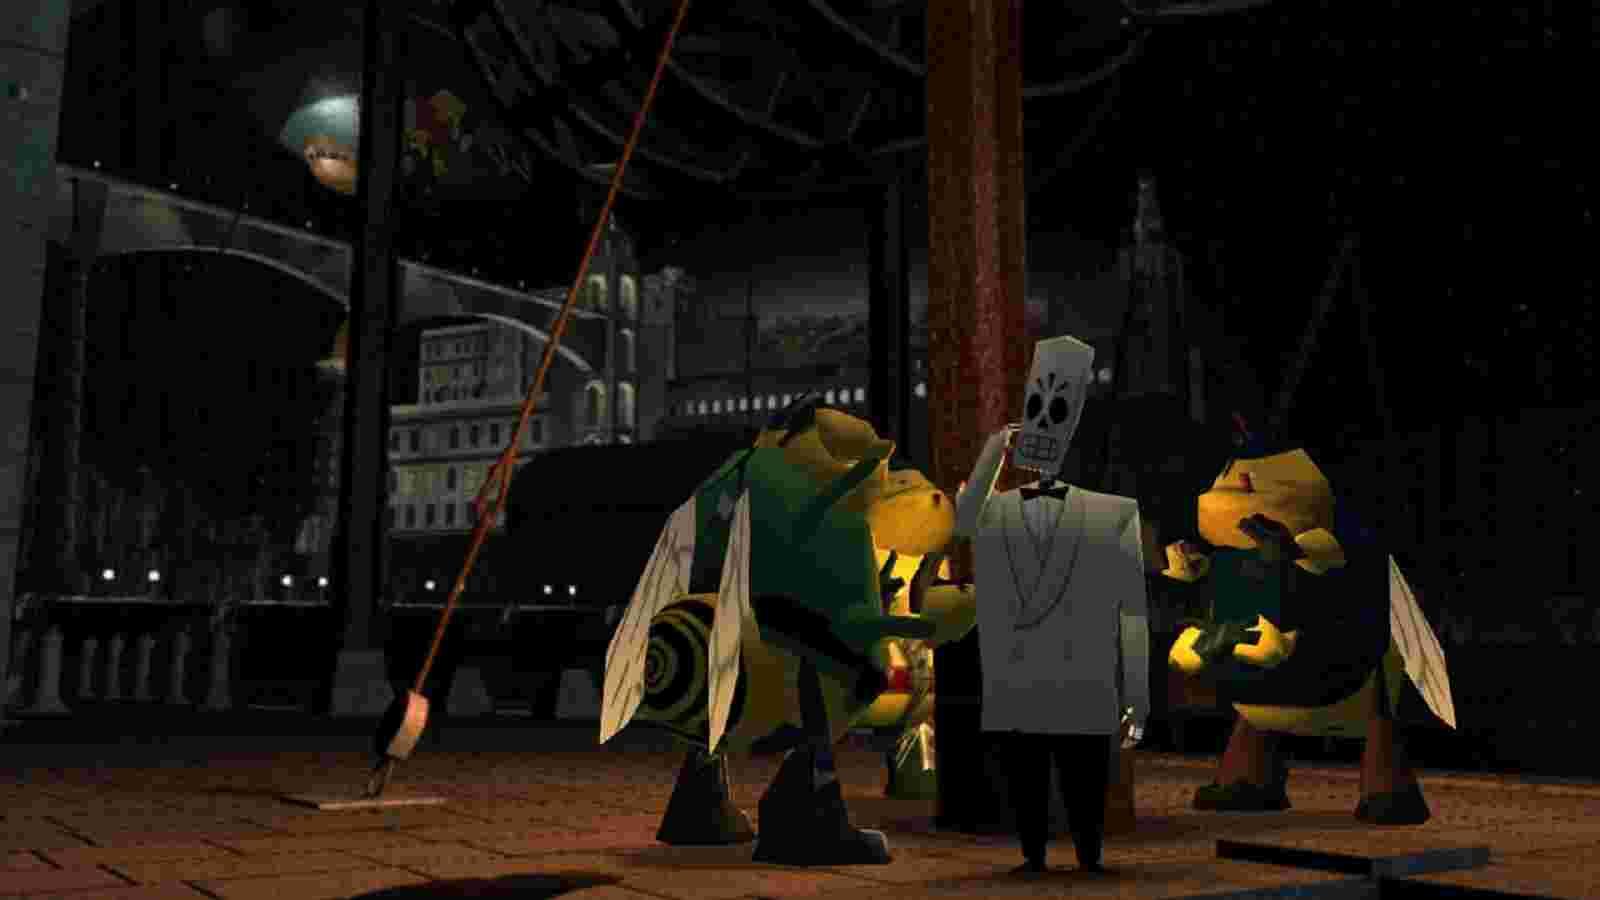 grim-fandango-remastered-bugs-gameplay-screenshot